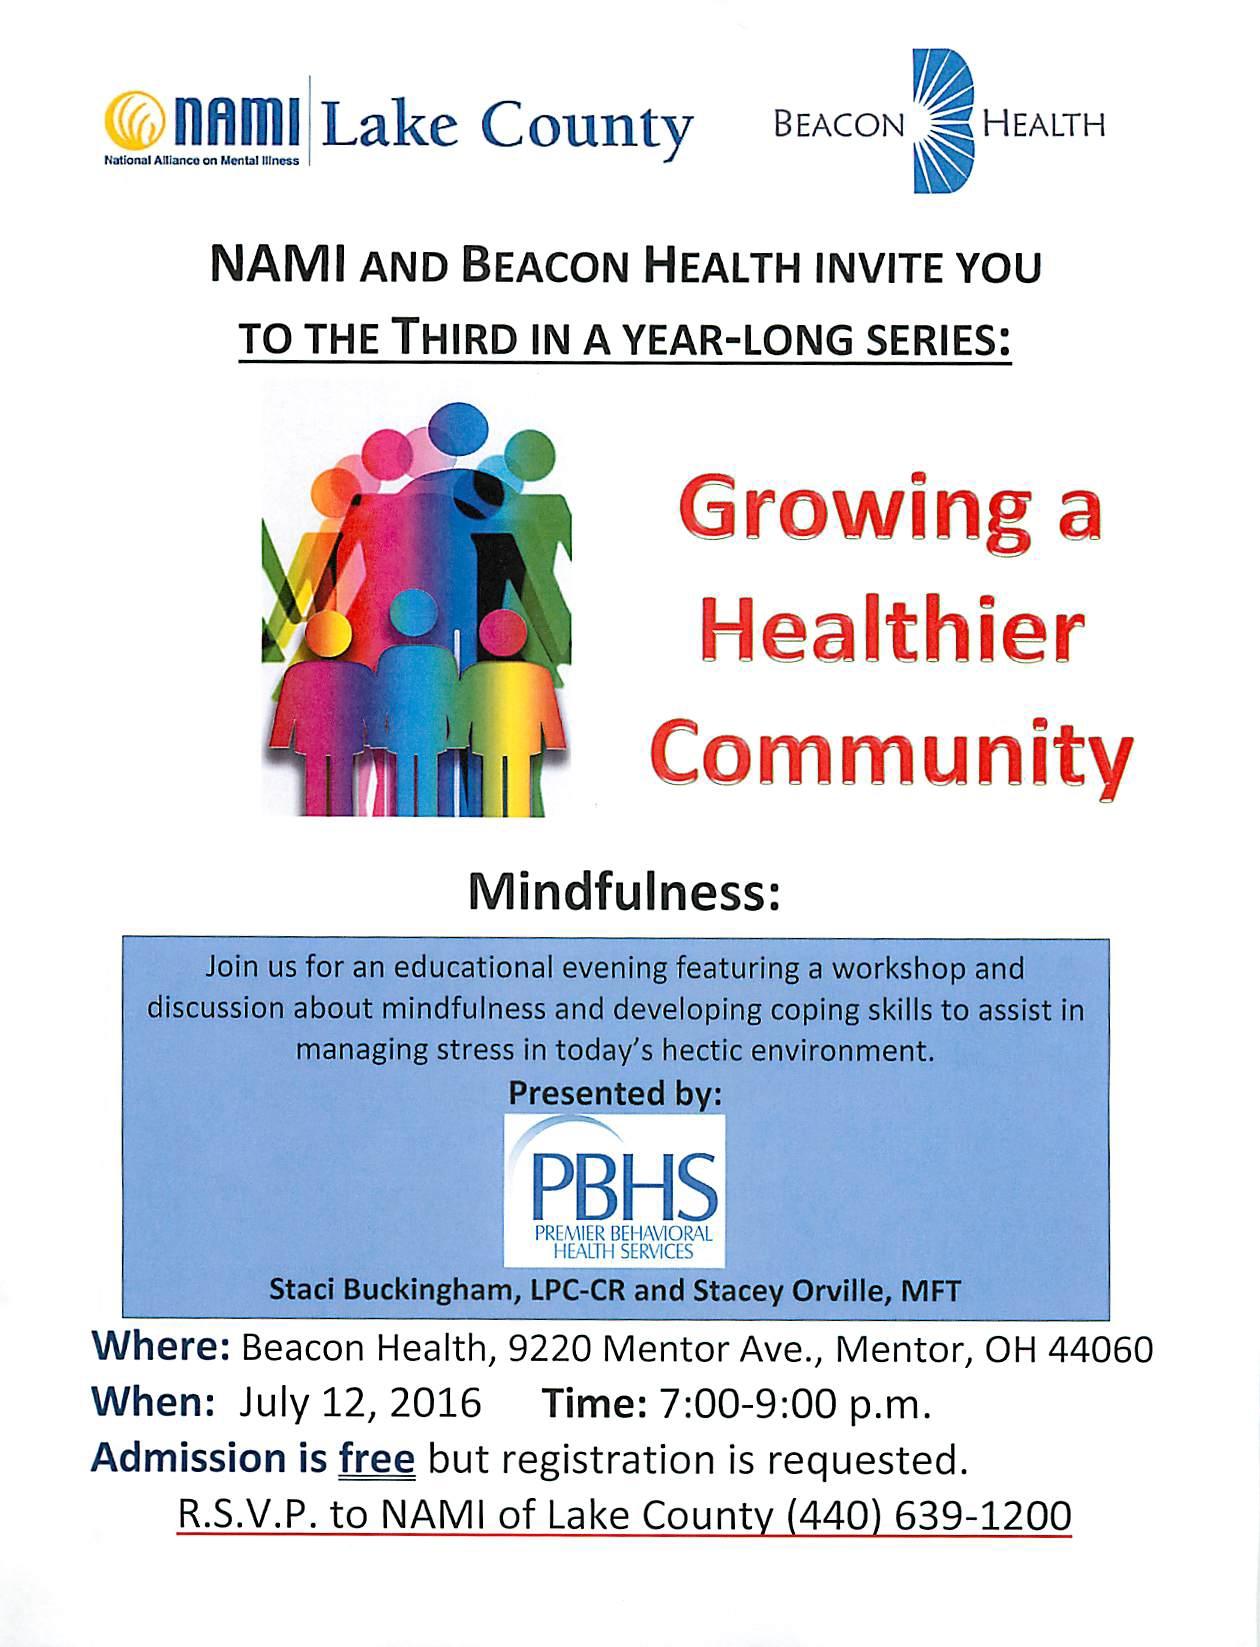 2016-07-12 NAMI Growing a Healthier Communtiy - Beacon